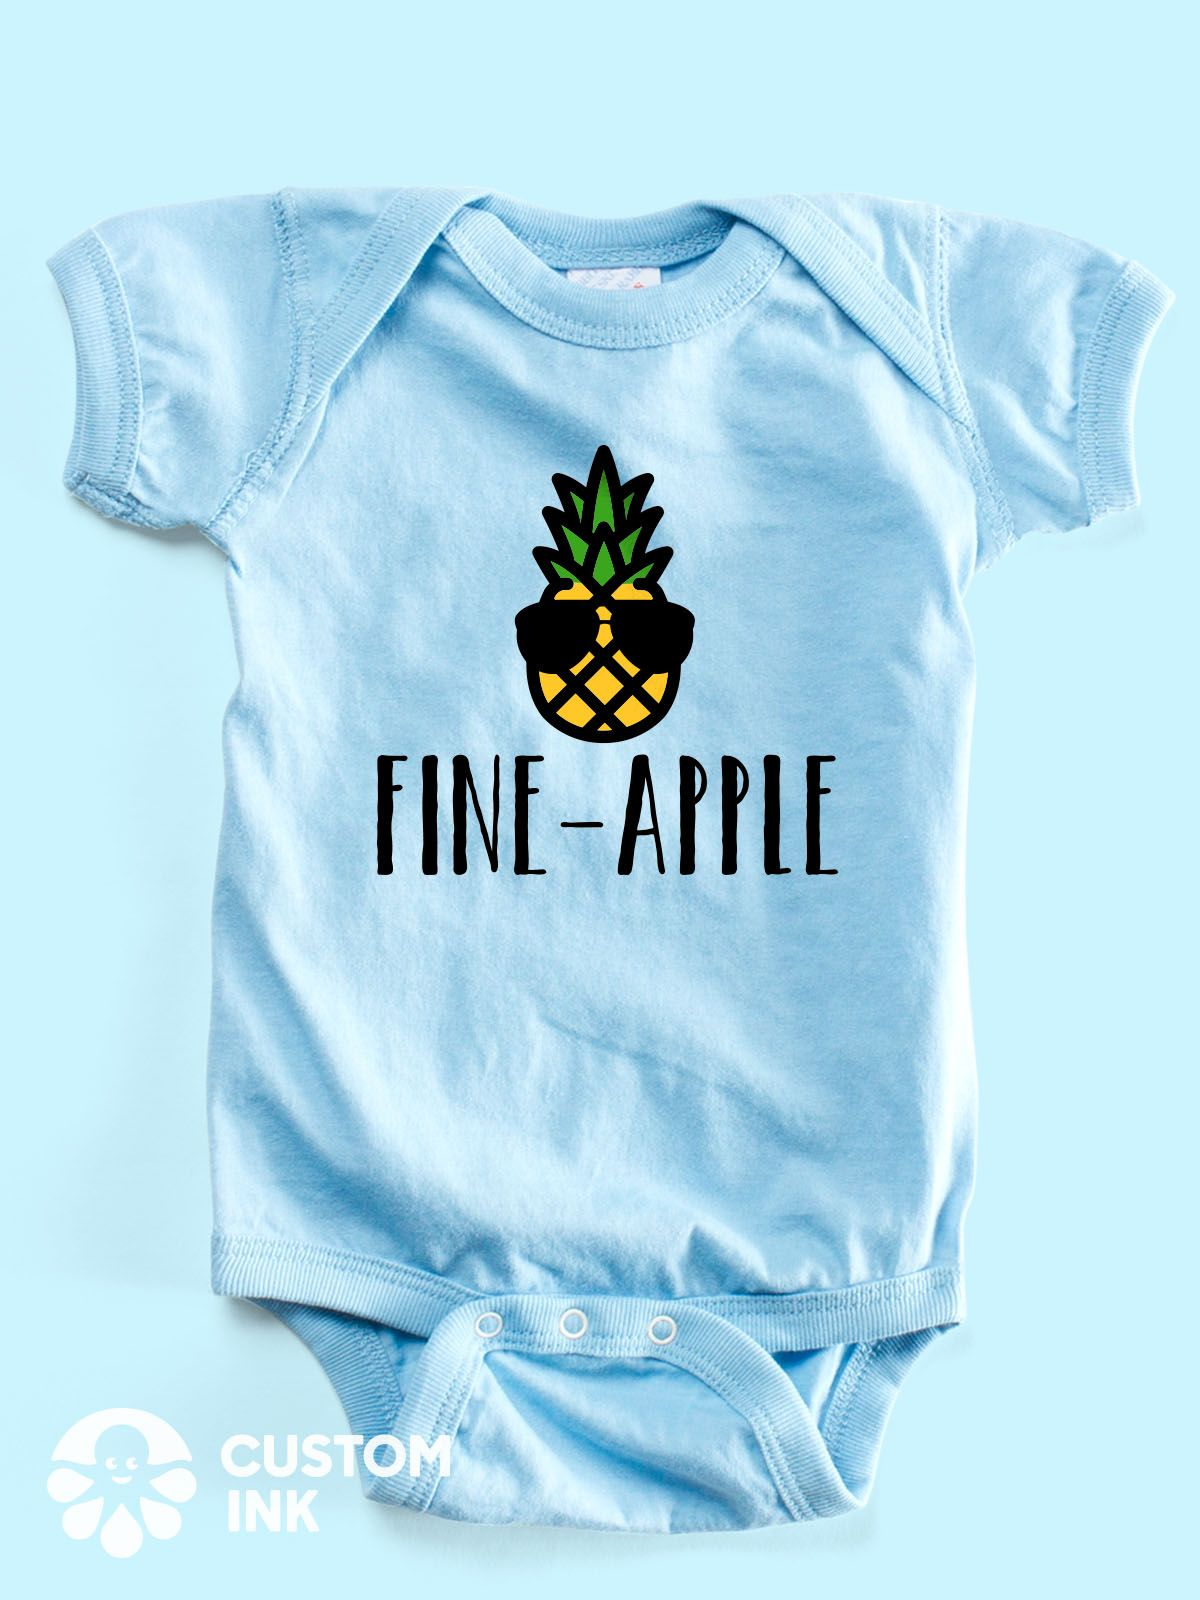 Baby Shower T Shirt Sayings : shower, shirt, sayings, Fine-Apple, Perfect, Funny, Saying, Design, Custom, Onesie,, T-shirt,, Hoodie,, Onesies,, Shirt, Designs,